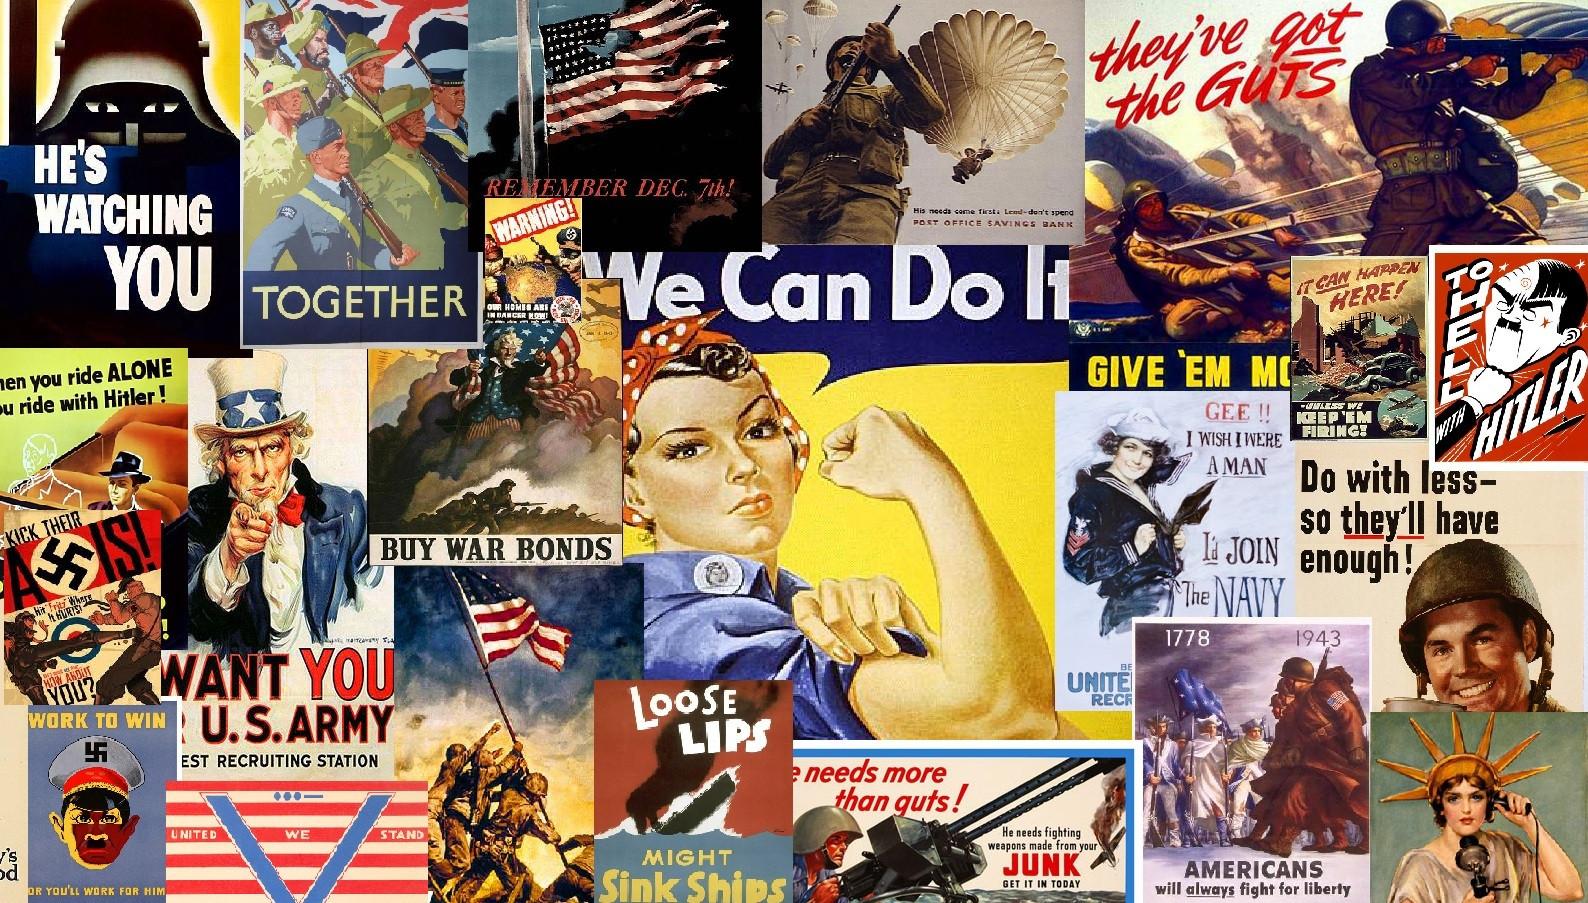 Wallpaper I Created Using Wwii Propaganda Posters Propaganda Posters Ww2 Collage 1194848 Hd Wallpaper Backgrounds Download